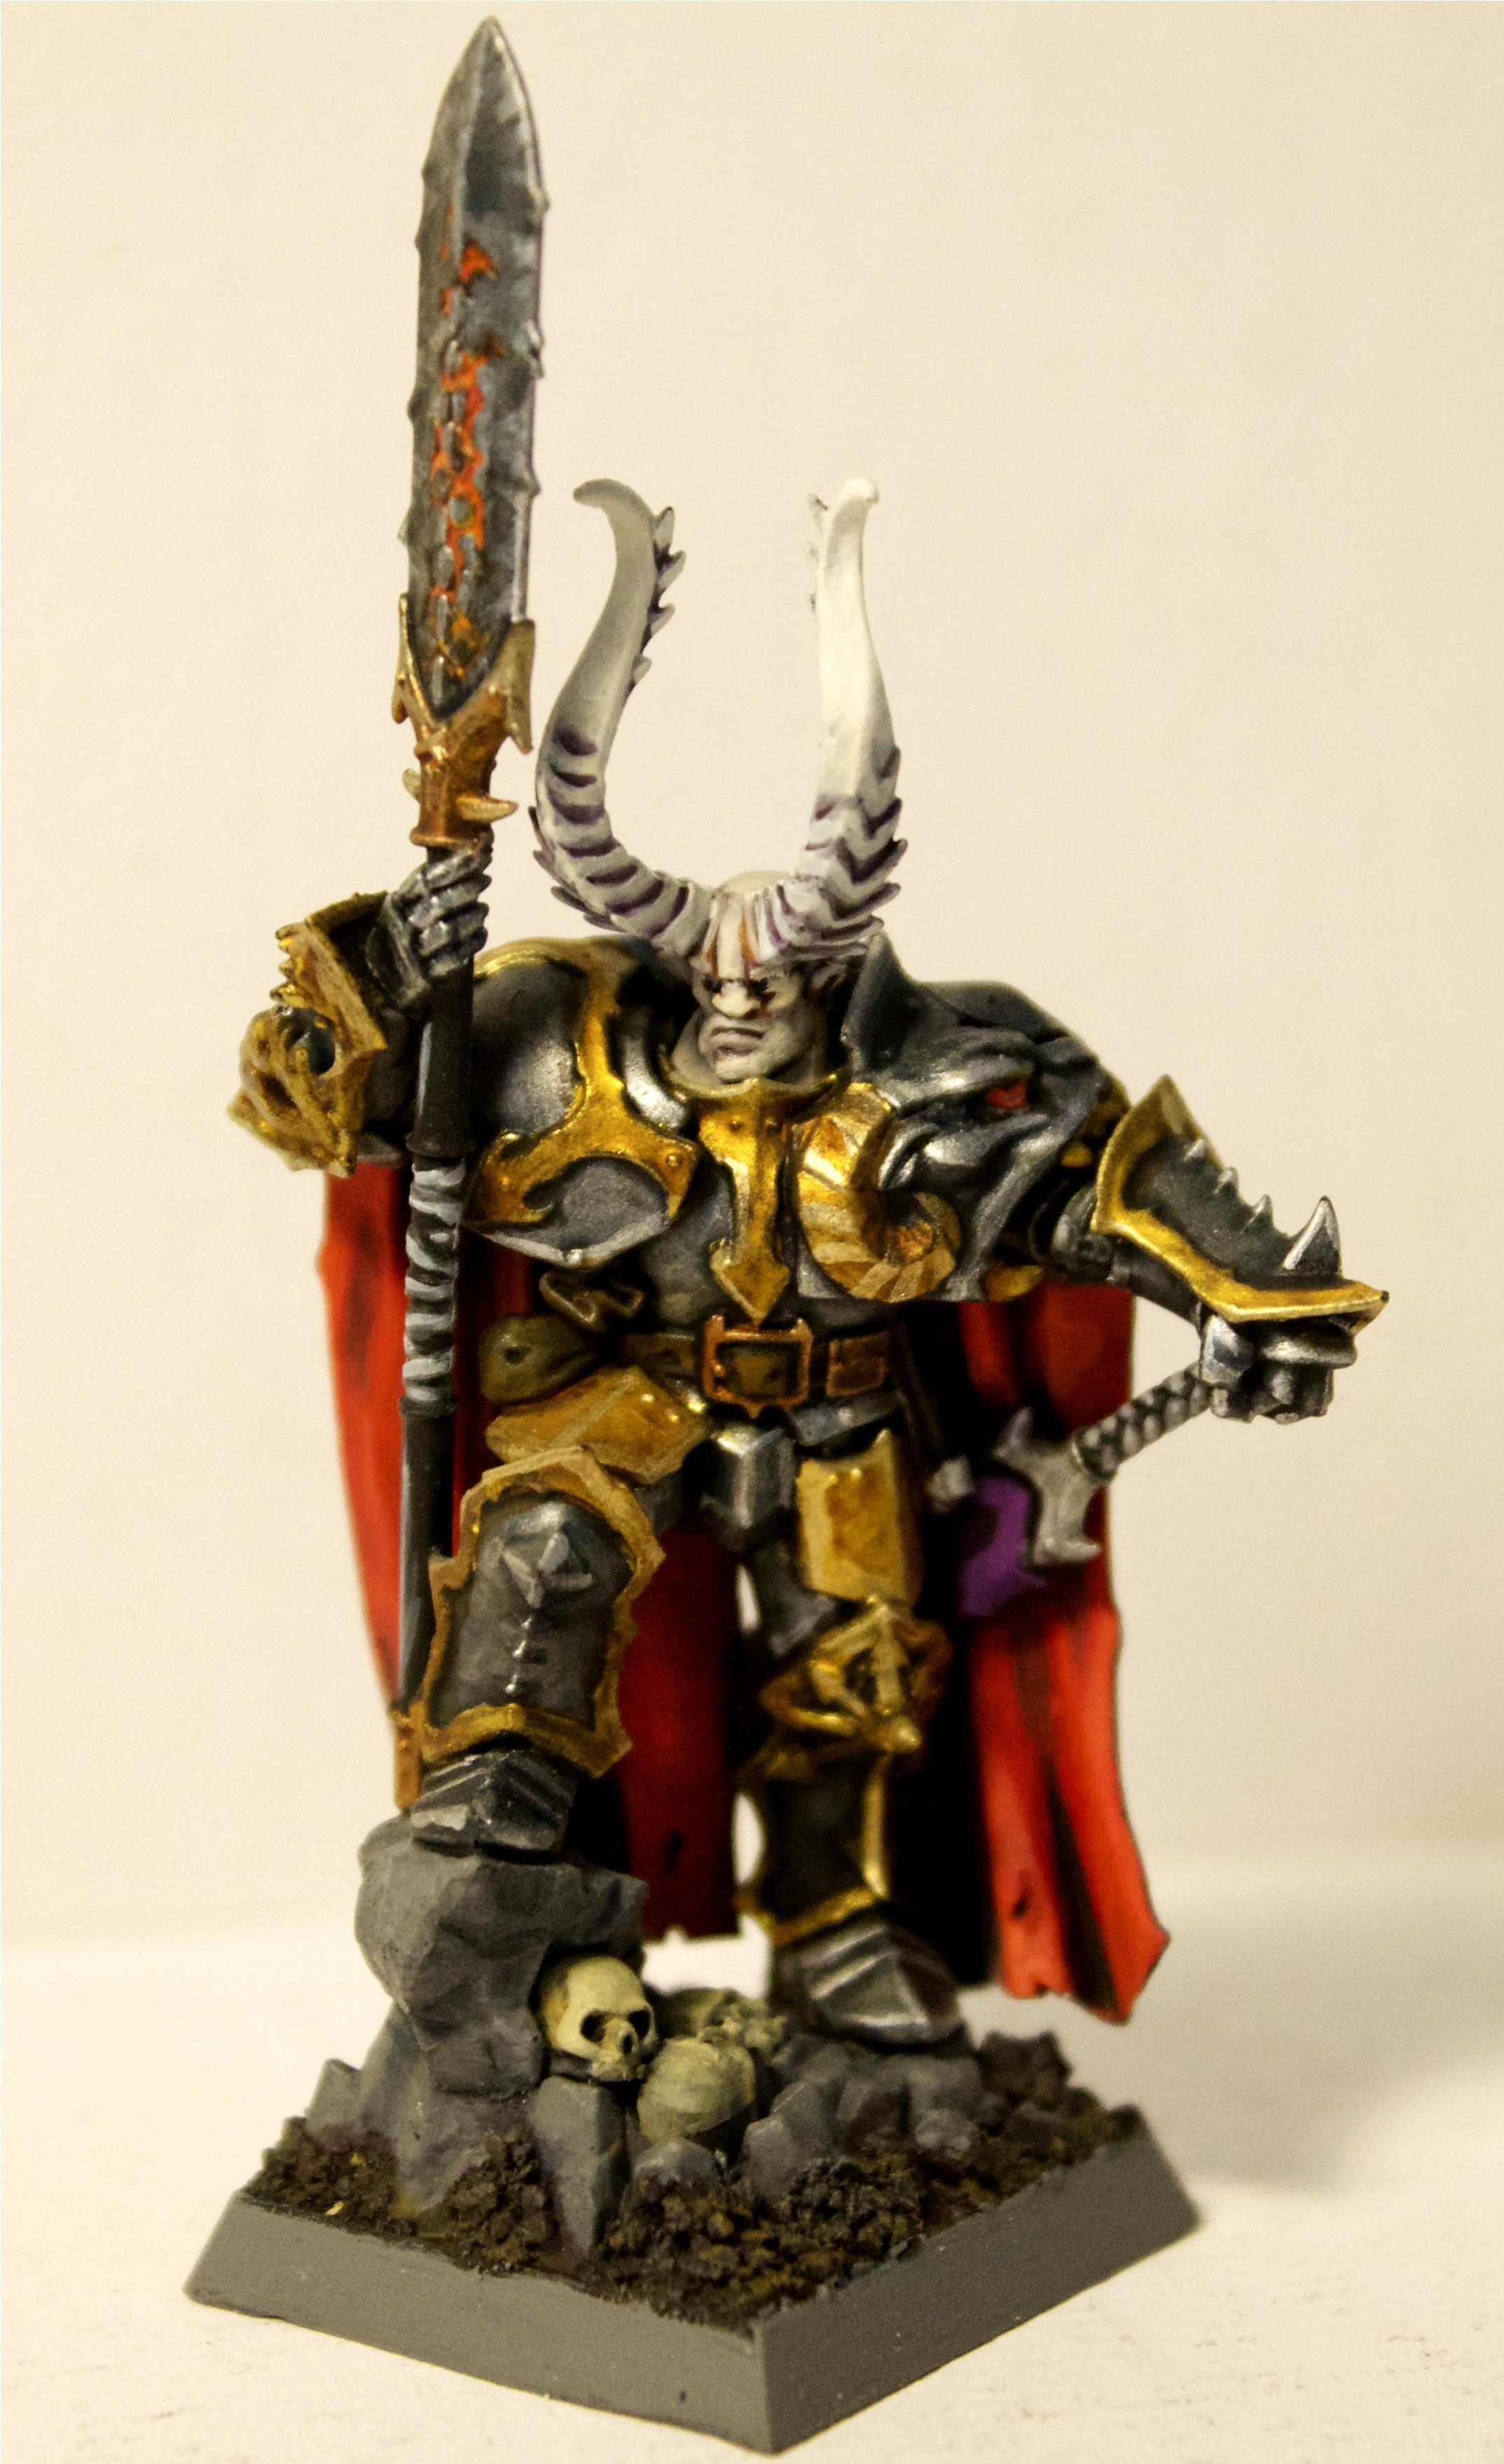 Armor, Base, Cape, Chaos, Chaos Lord, Daemons, Hero, Horns, Lord, Warhammer Fantasy, Warriors Of Chaos